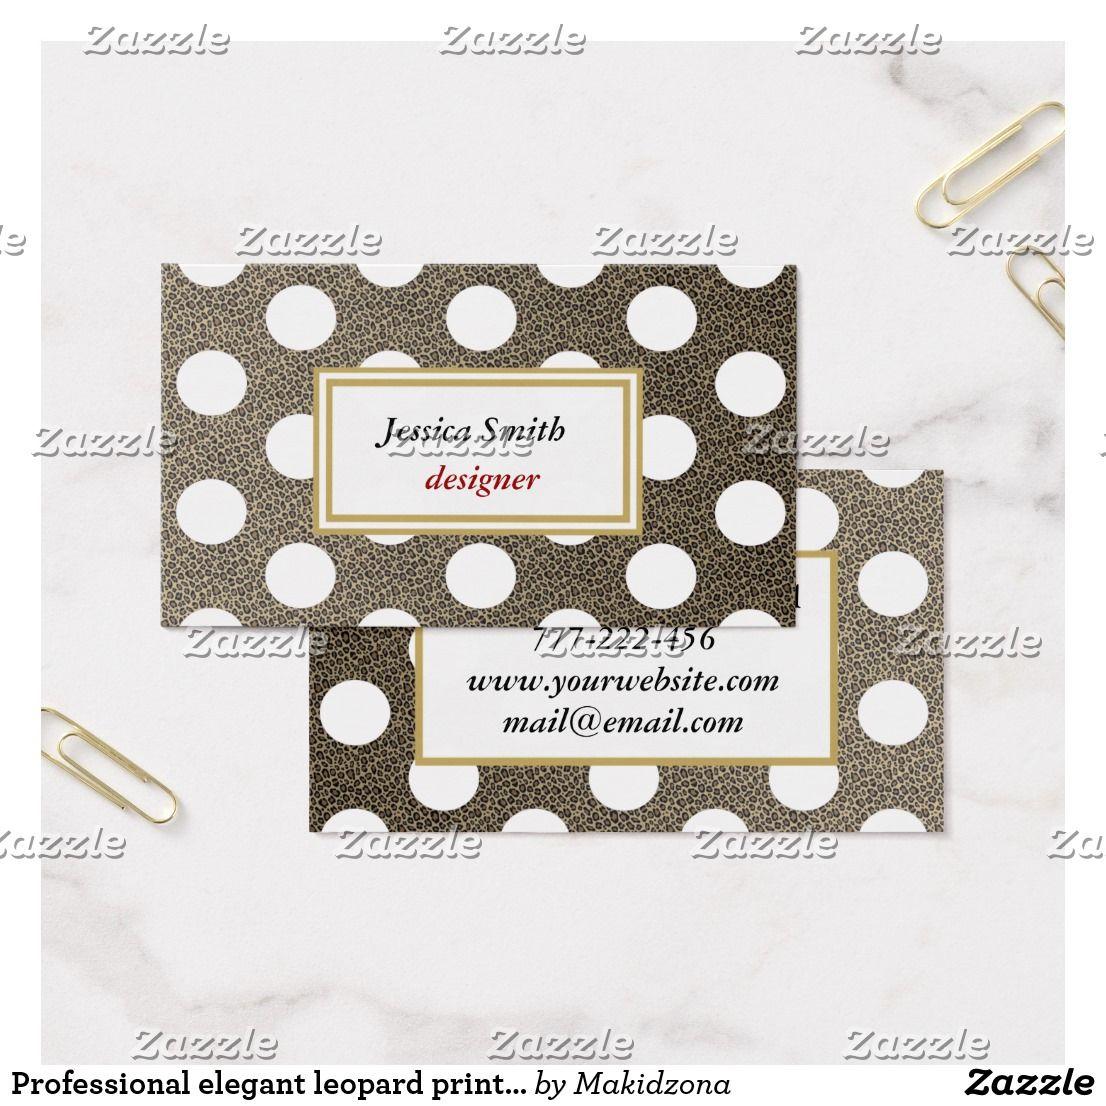 Professional elegant leopard print polka dots business card ...